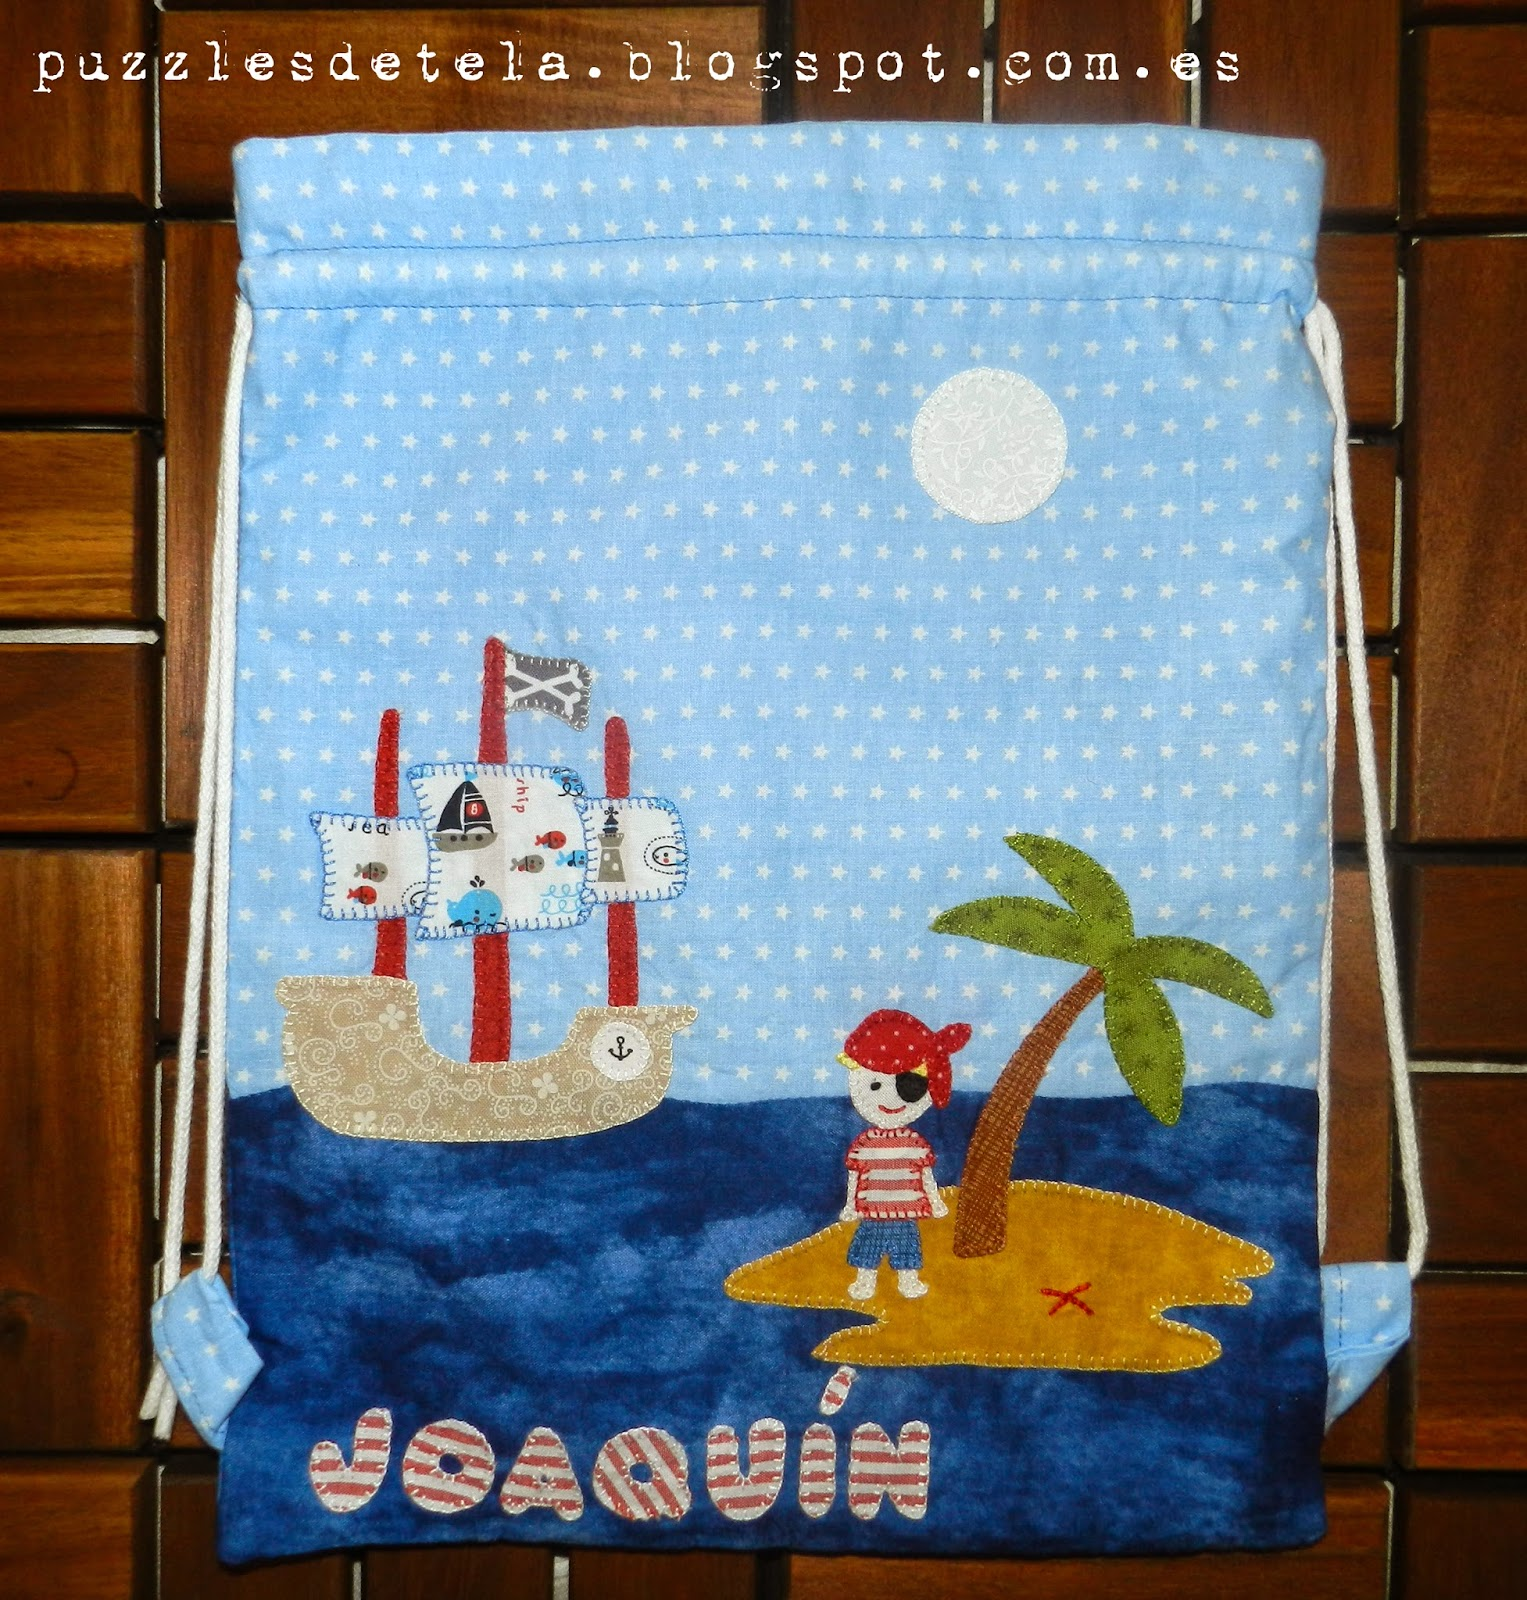 Mochila patchwork, mochilas patchwork piratas, piratas patchwork, patchwork, mochila, bolsa de almuerzo, bolsa de almuerzo patchwork, bolsa de merienda, bolsa de merienda patchwork, barco pirata patchwork, pirata patchwork, isla del tesoro, barco pirata